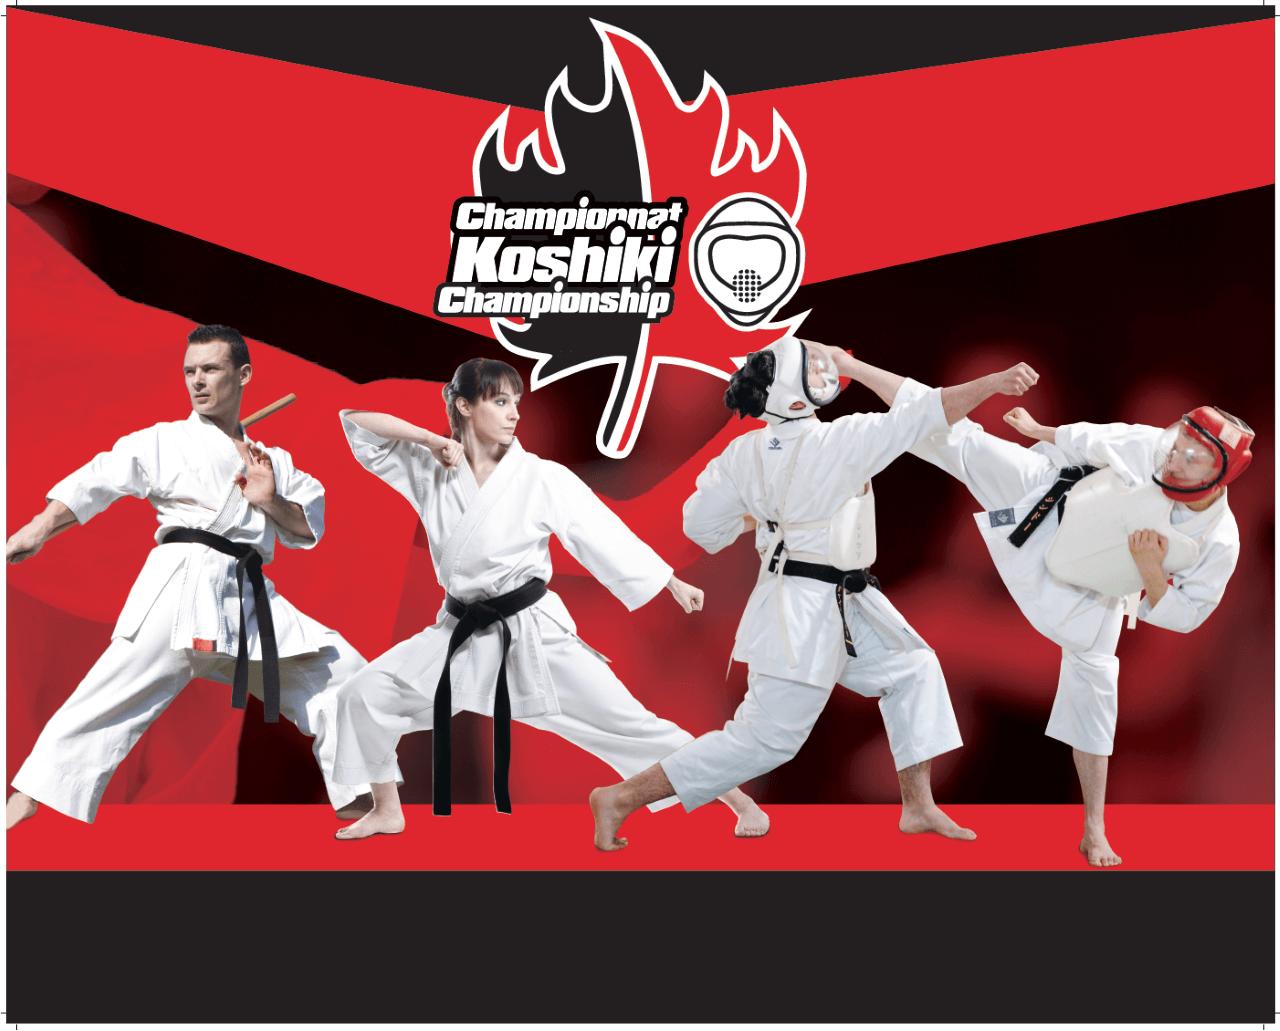 Championnat Est-canadien de Koshiki - Sherbrooke